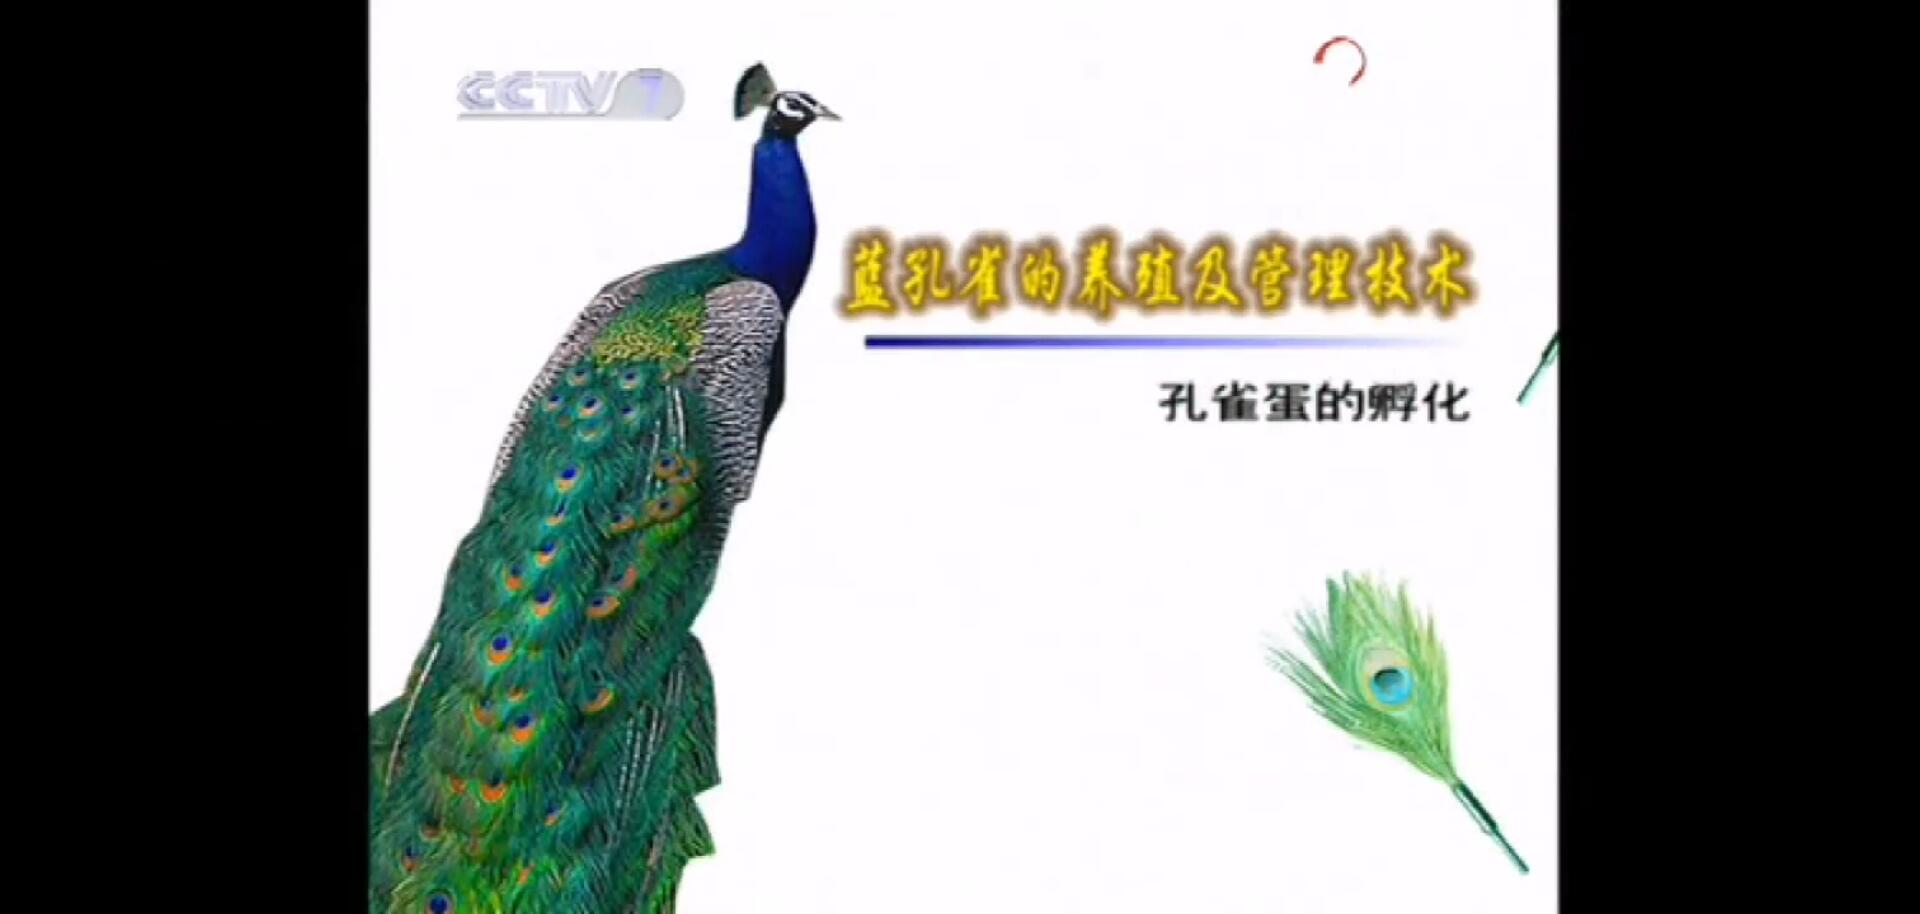 CCTV-7农广天地中华彩票网是不是真的养殖技术